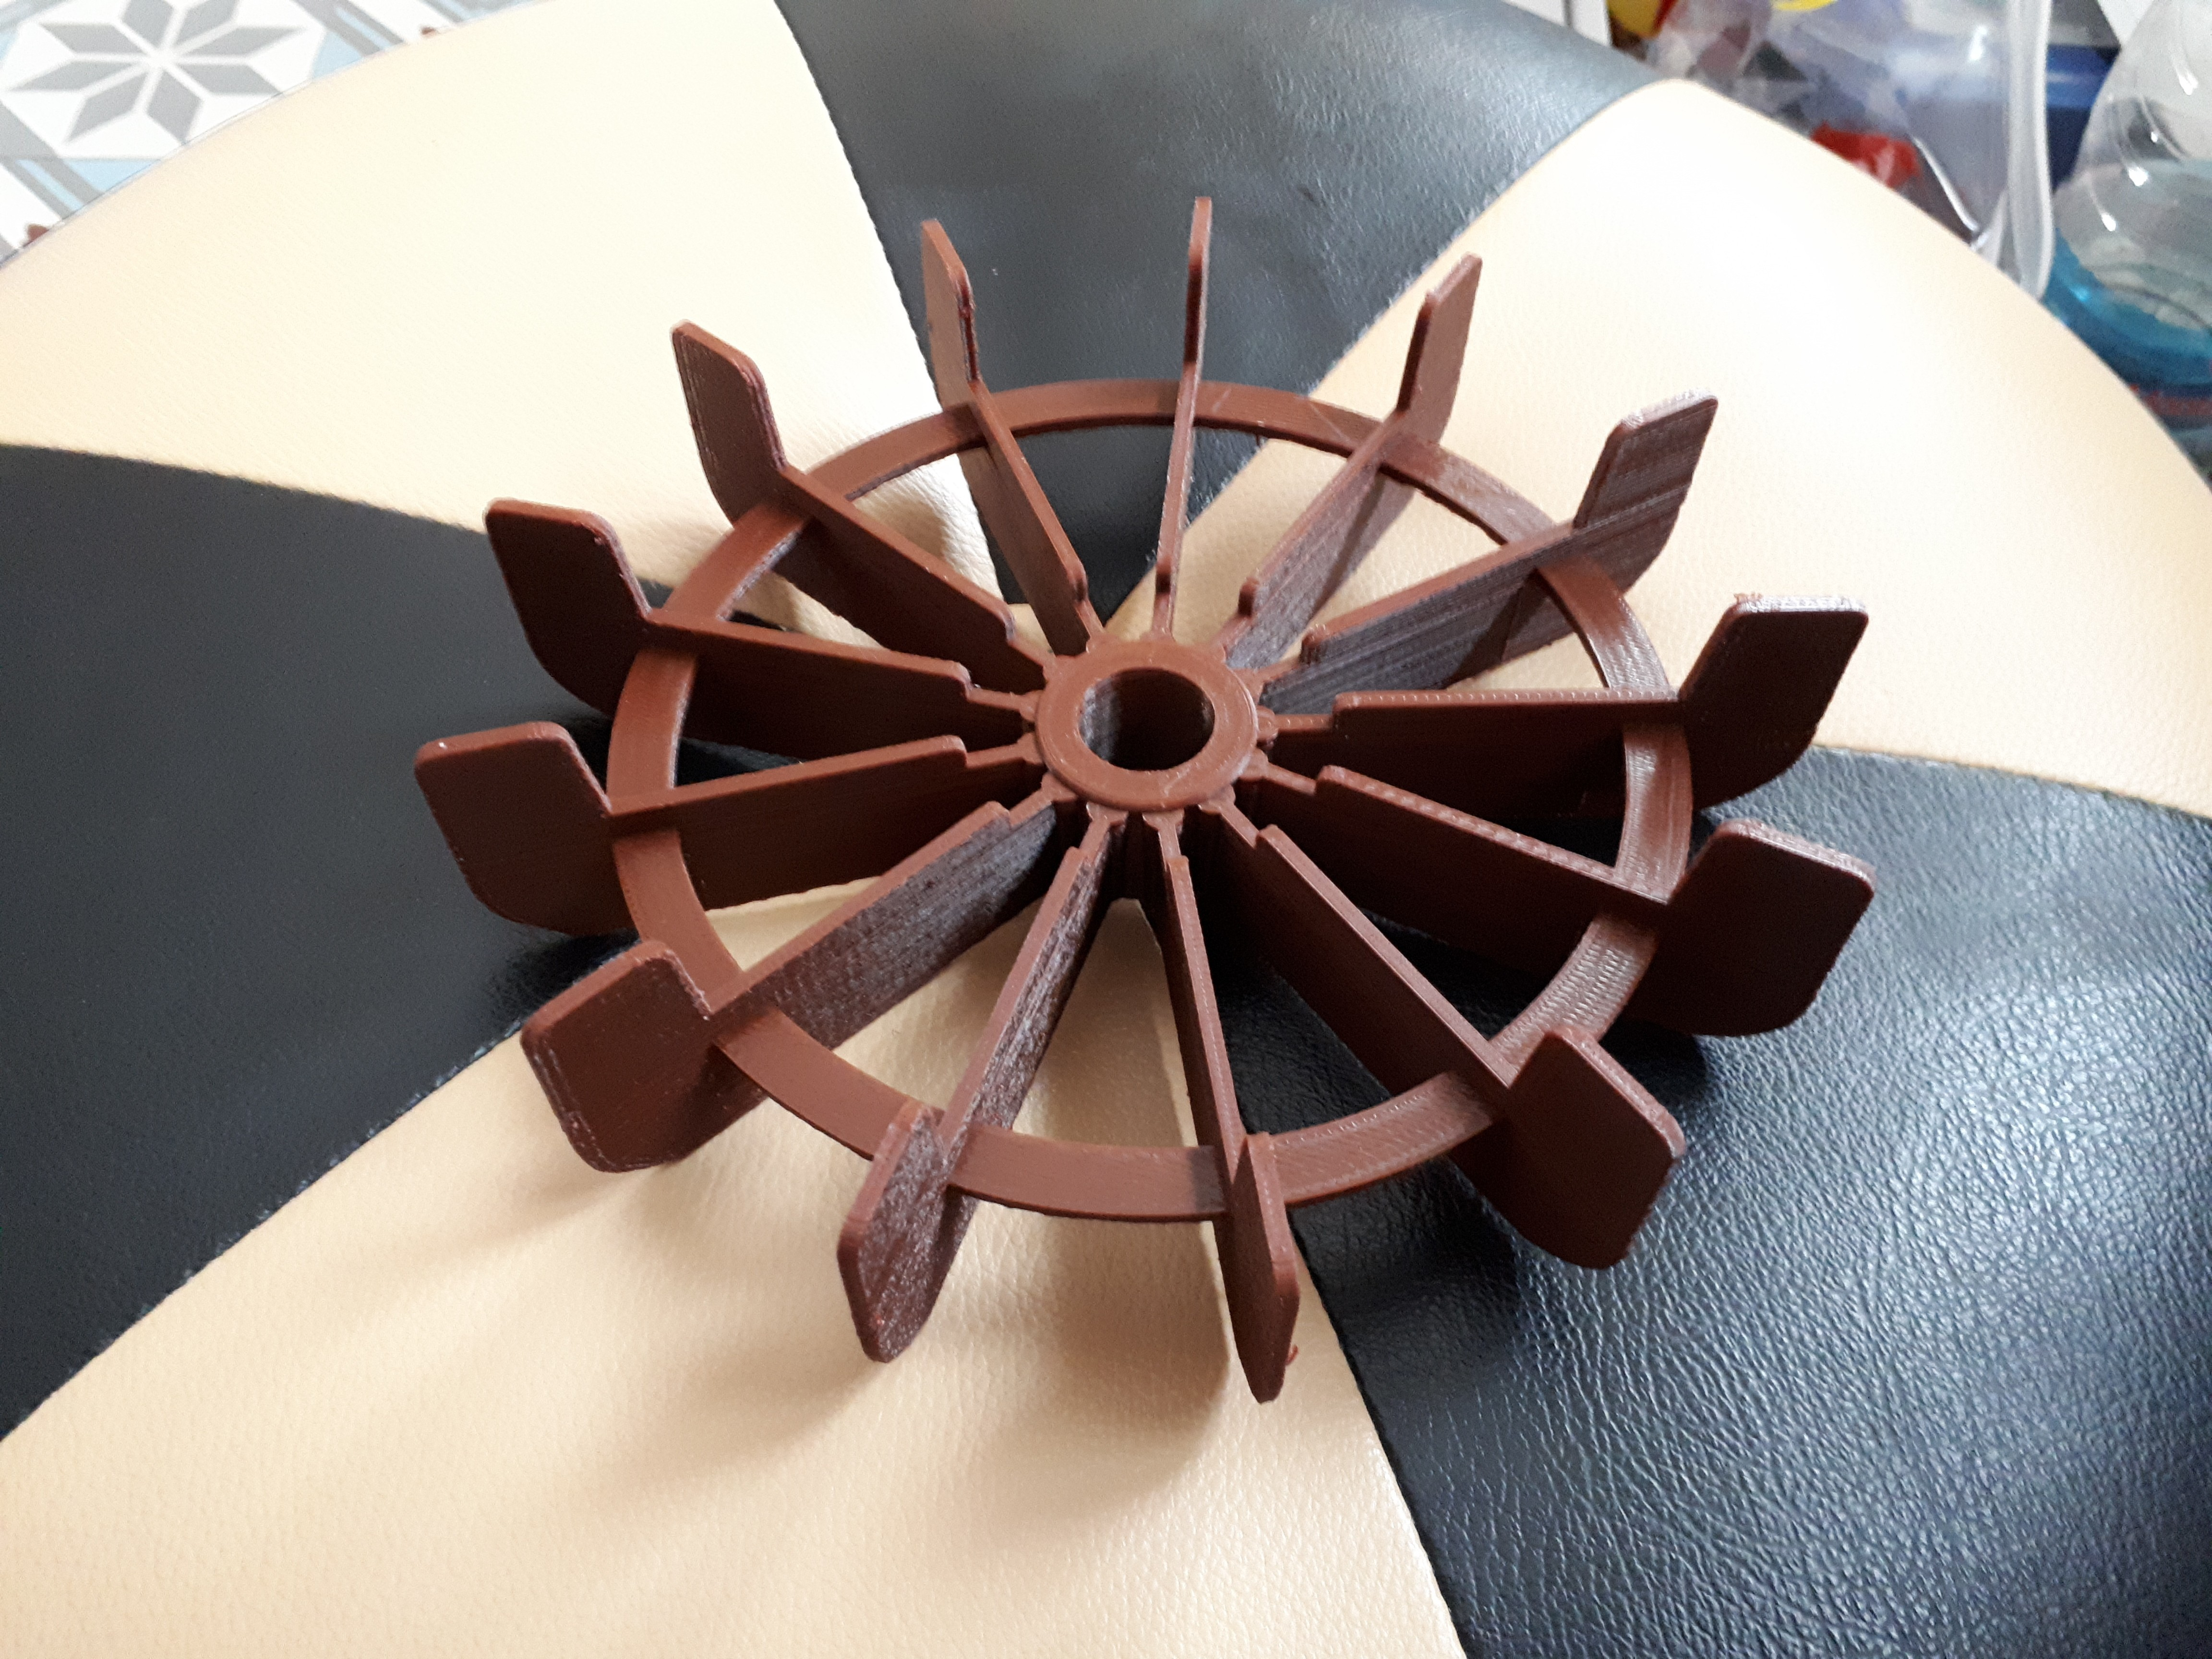 20180625_185055.jpg Download STL file electric motor cooling • 3D print object, nicodem6087